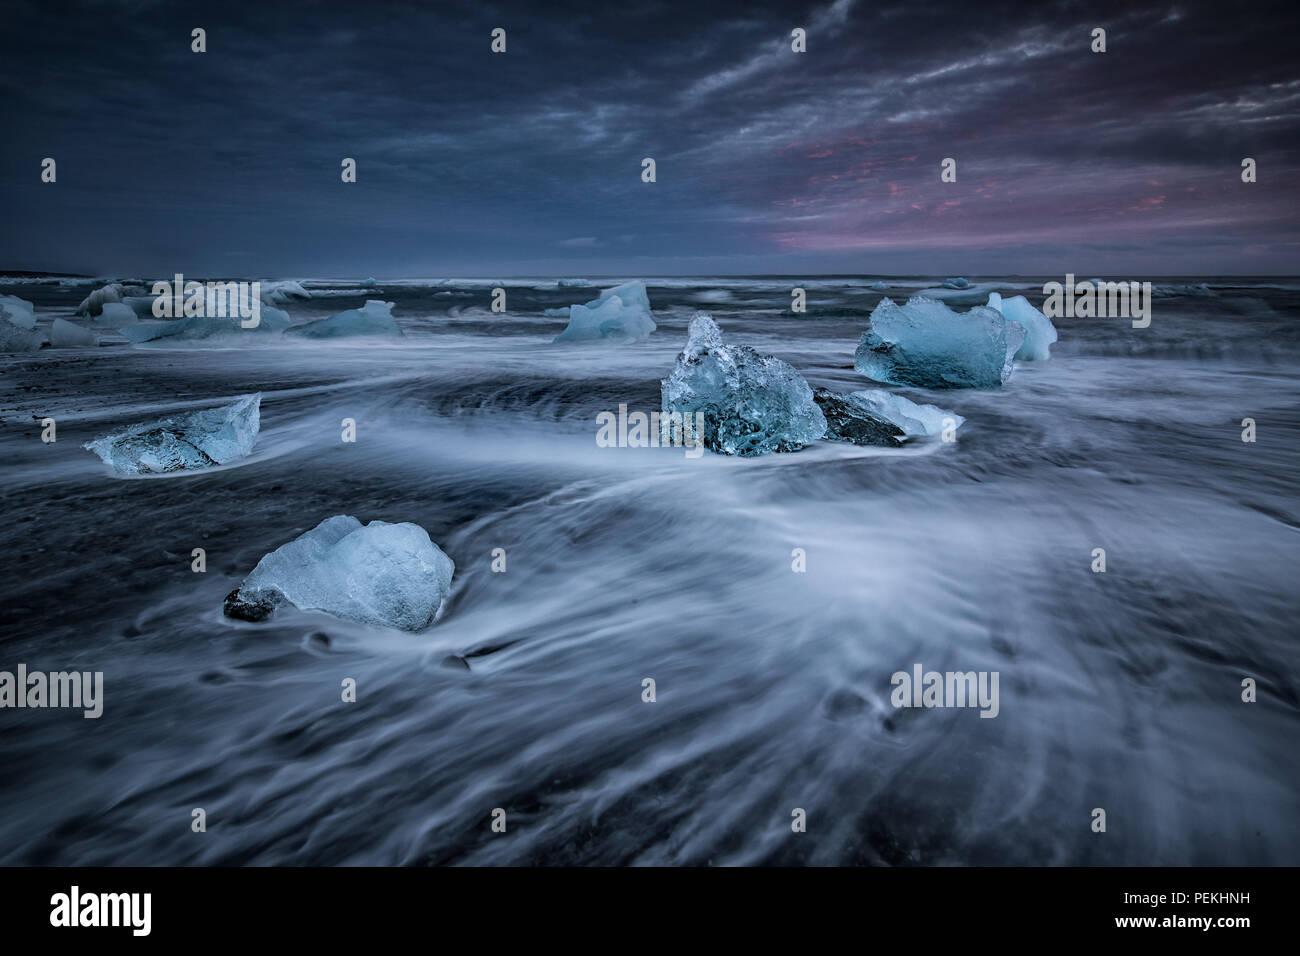 Glacial Ice washed ashore on the beach at Jokulsarlon Black Sand Beach also known as Breidamerkursandur, Iceland - Stock Image